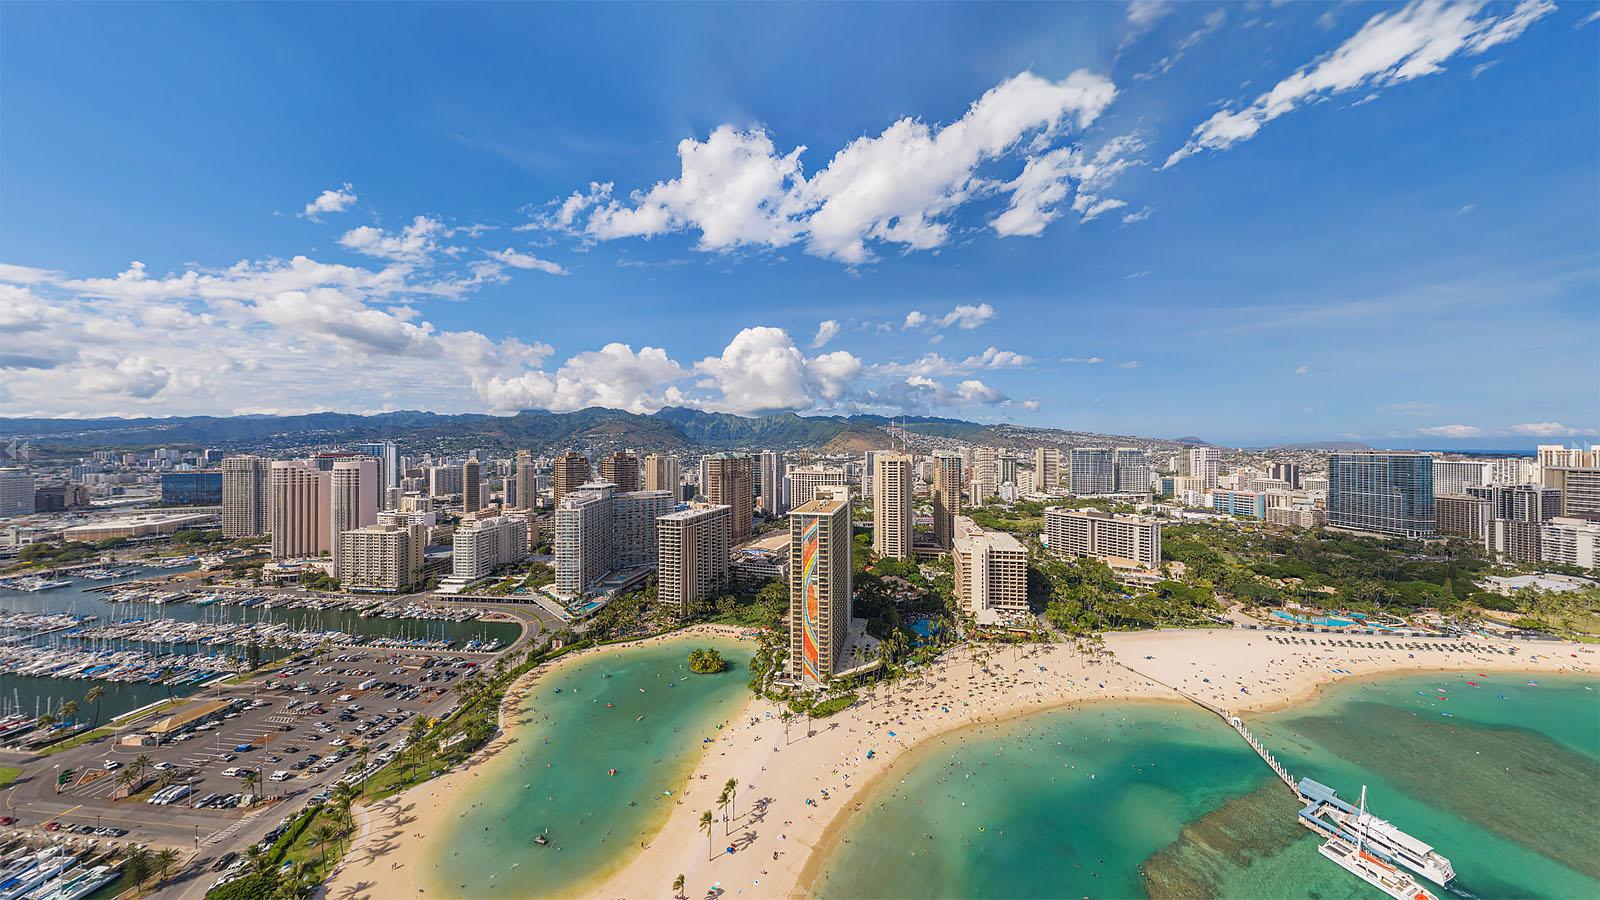 Aerial Panorama of Developments - Waikiki